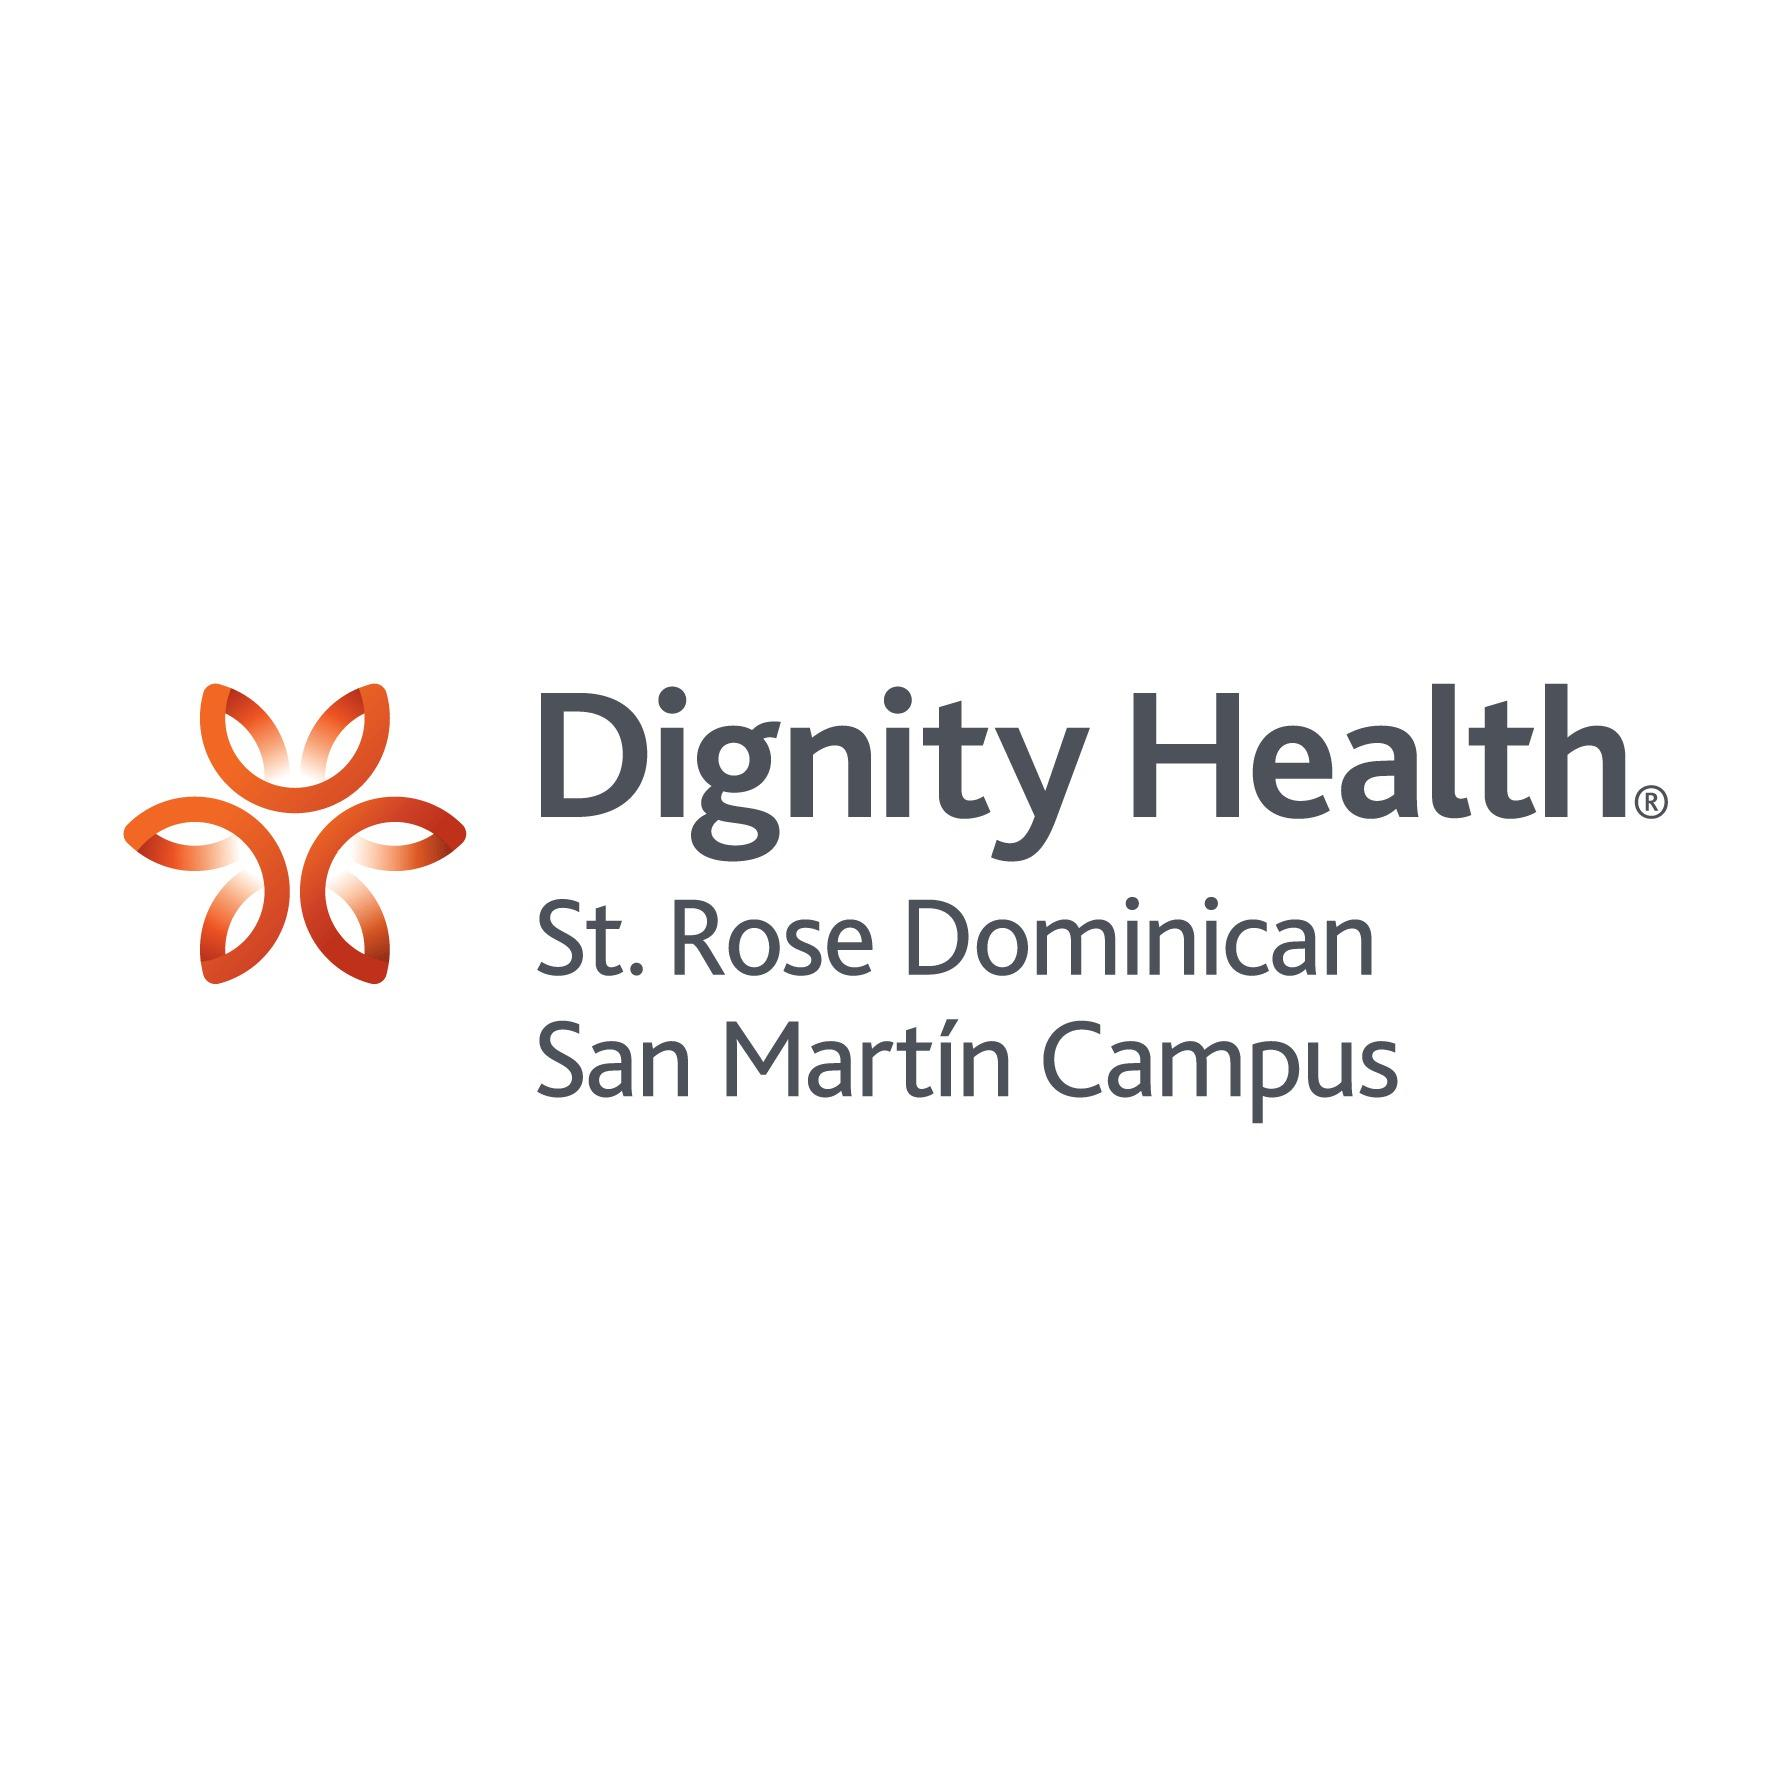 Dignity Health - St. Rose Dominican Hospital, San Martin Campus - Las Vegas, NV